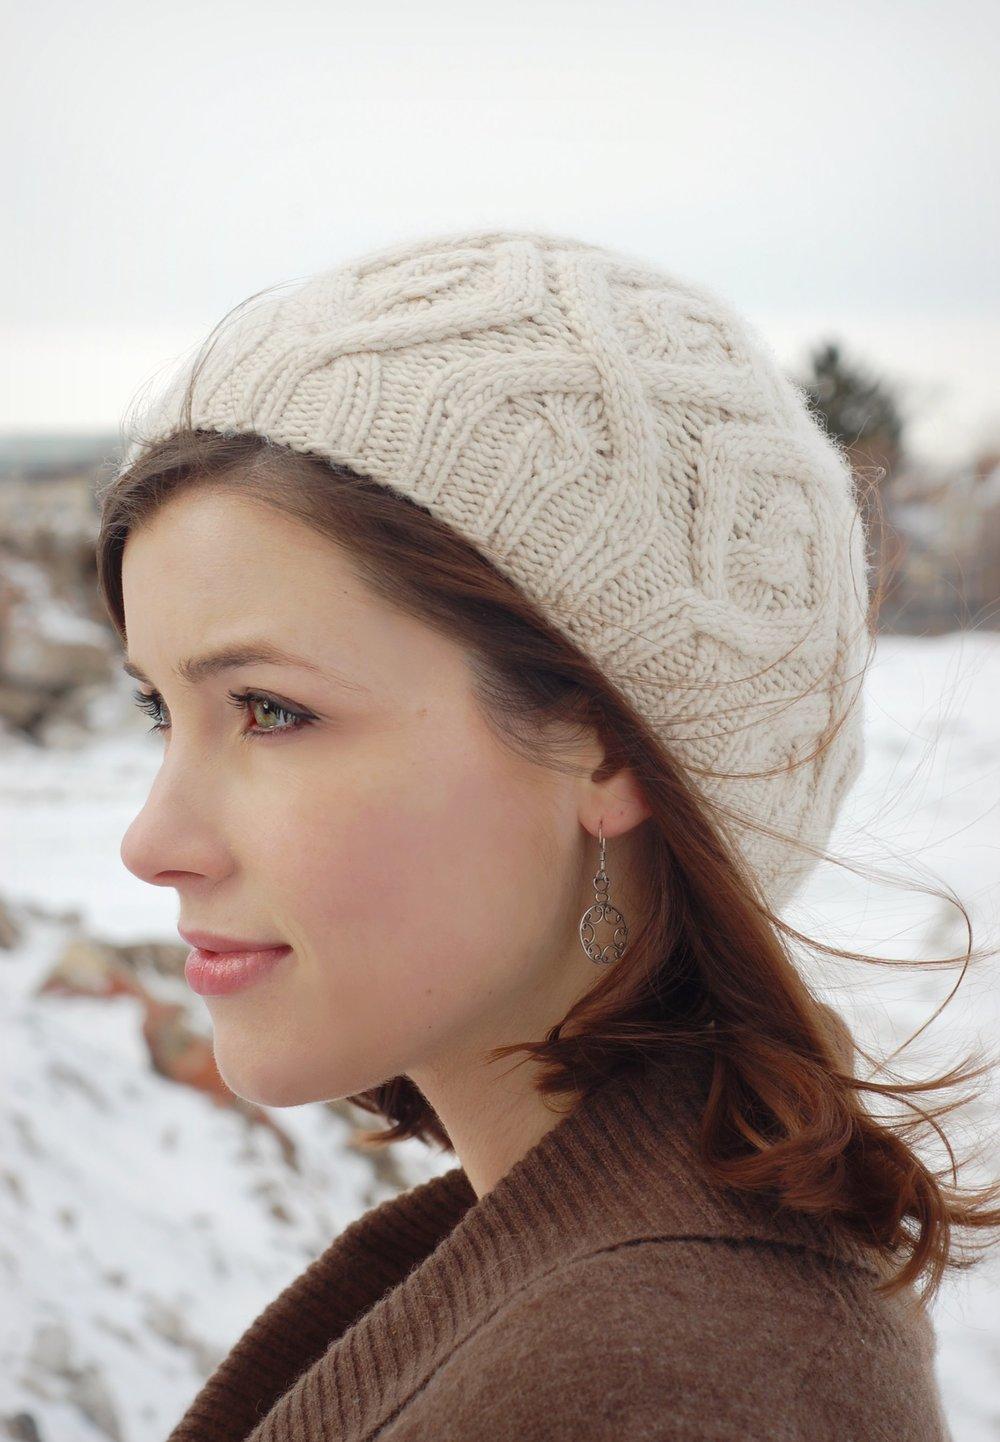 AlanaDakos_WinterTrails_1.jpg